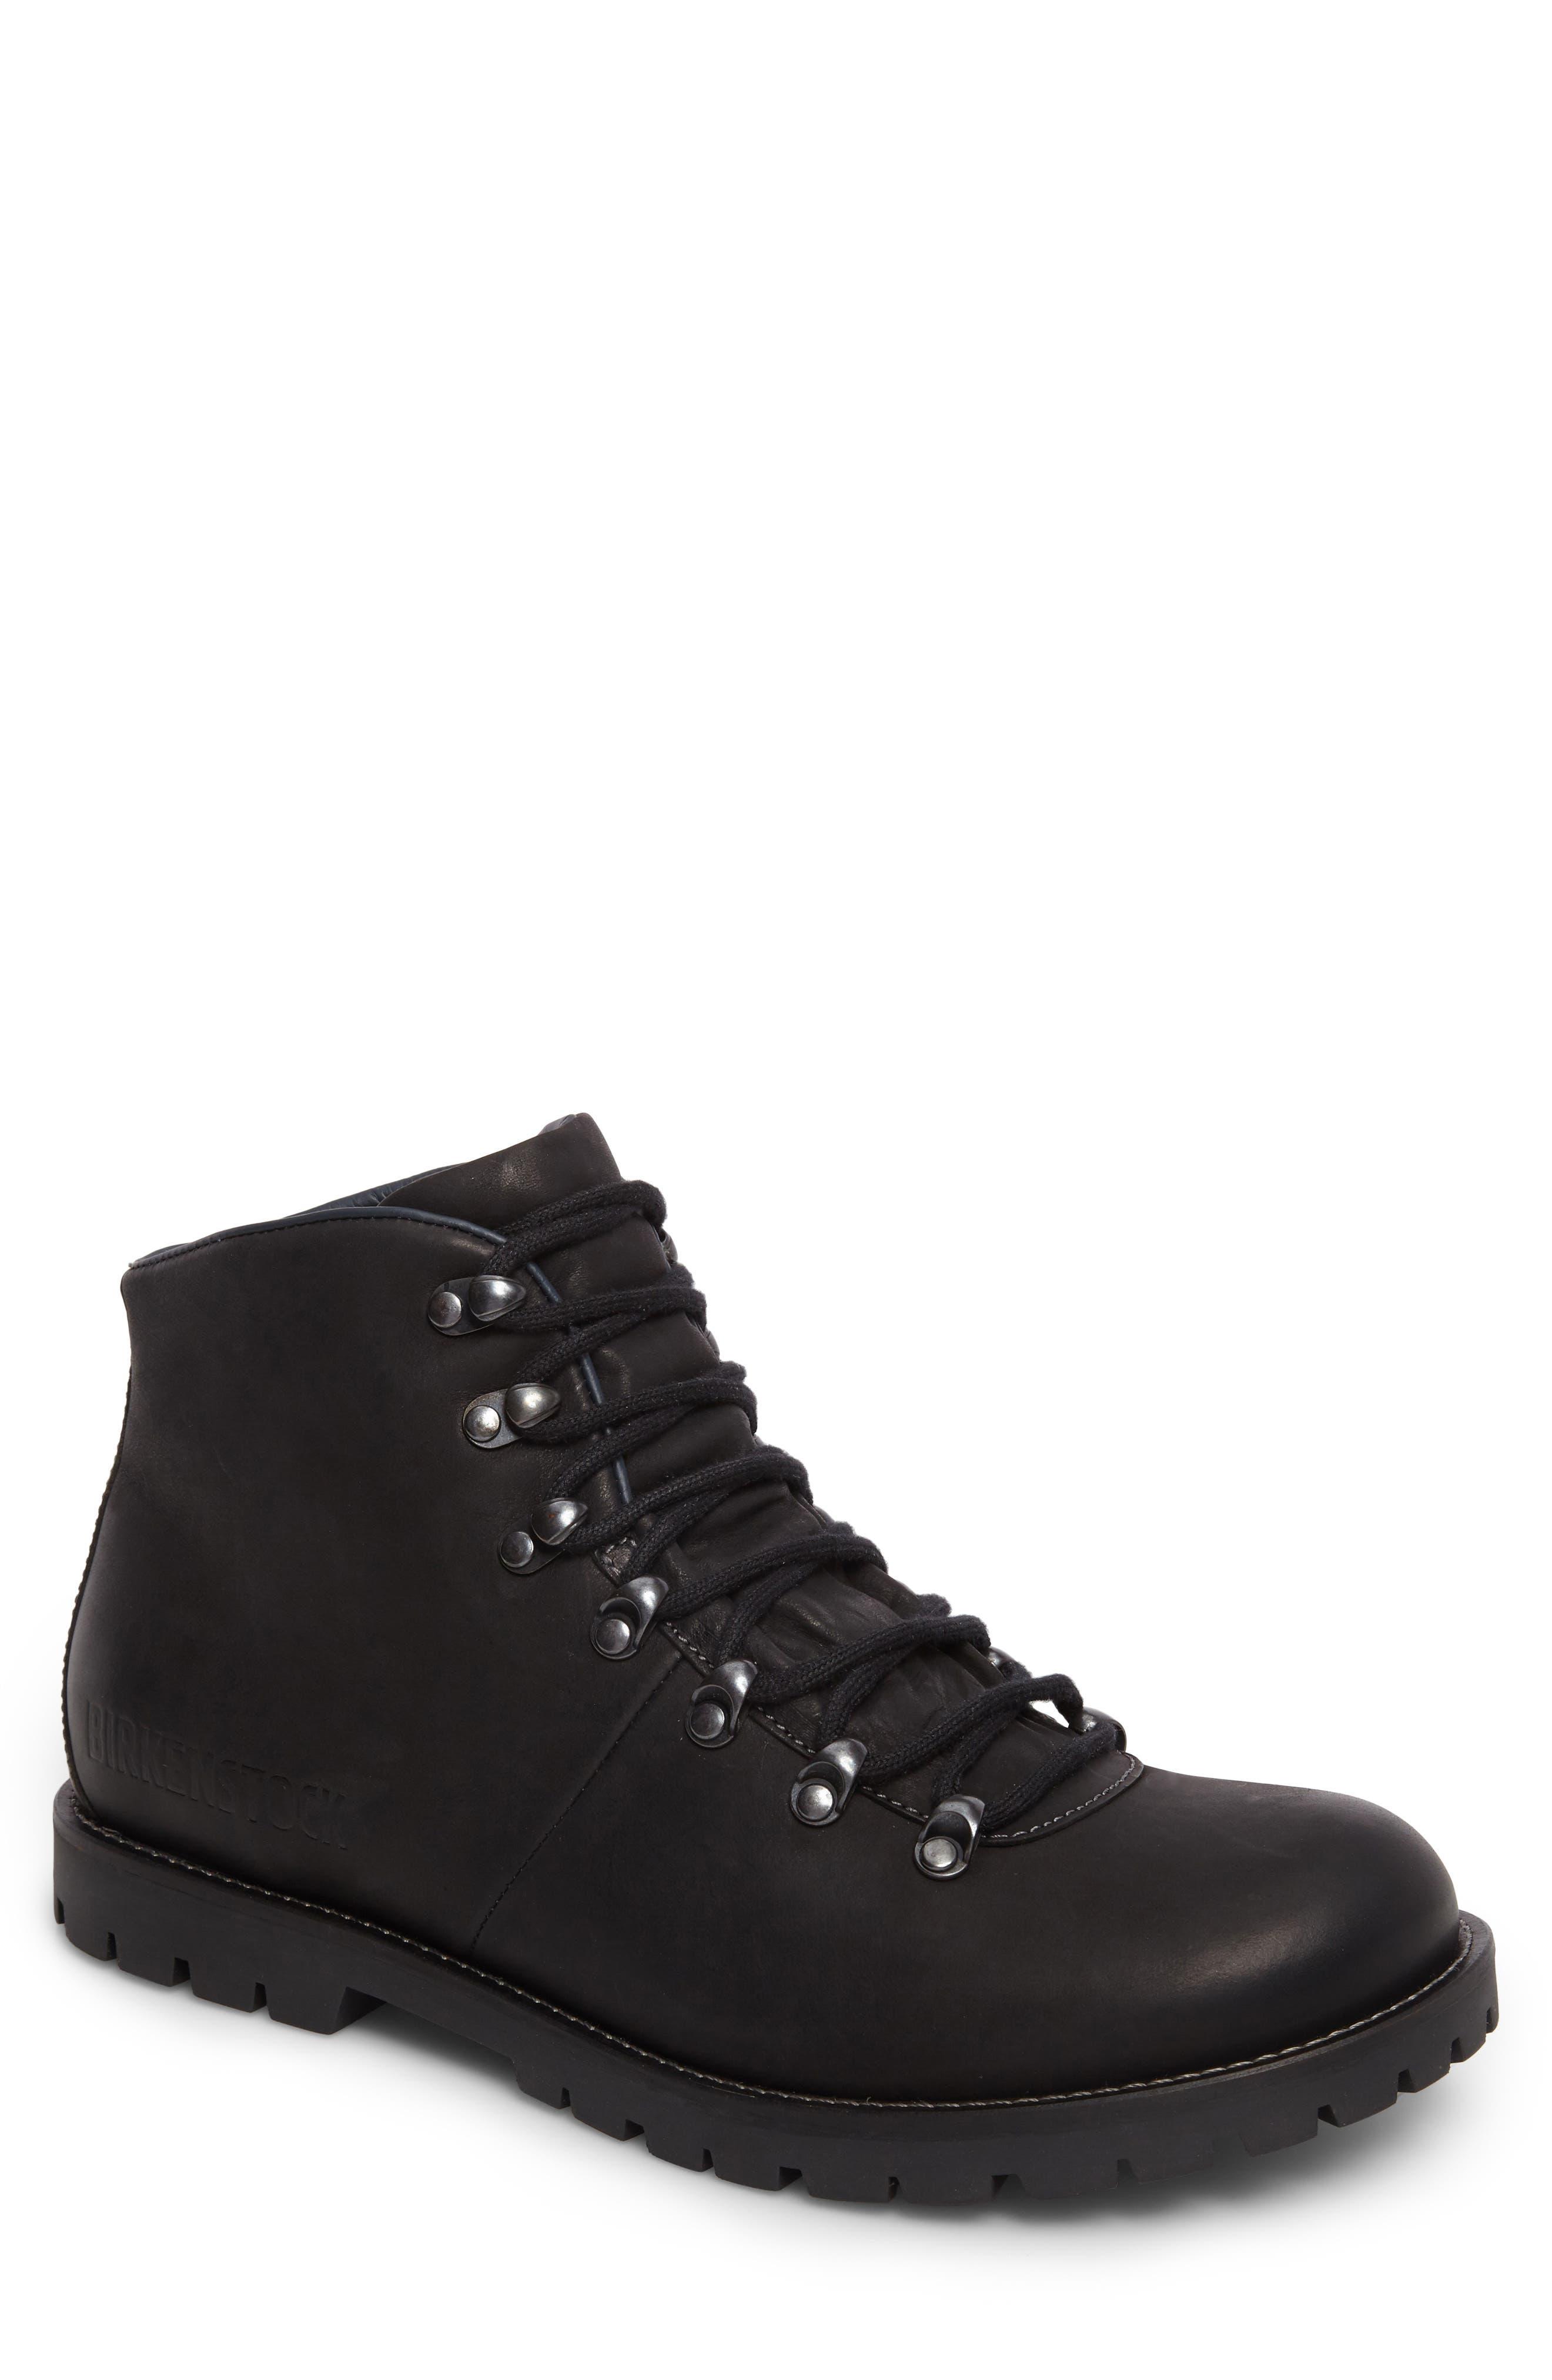 Hancock Plain Toe Boot,                         Main,                         color, BLACK